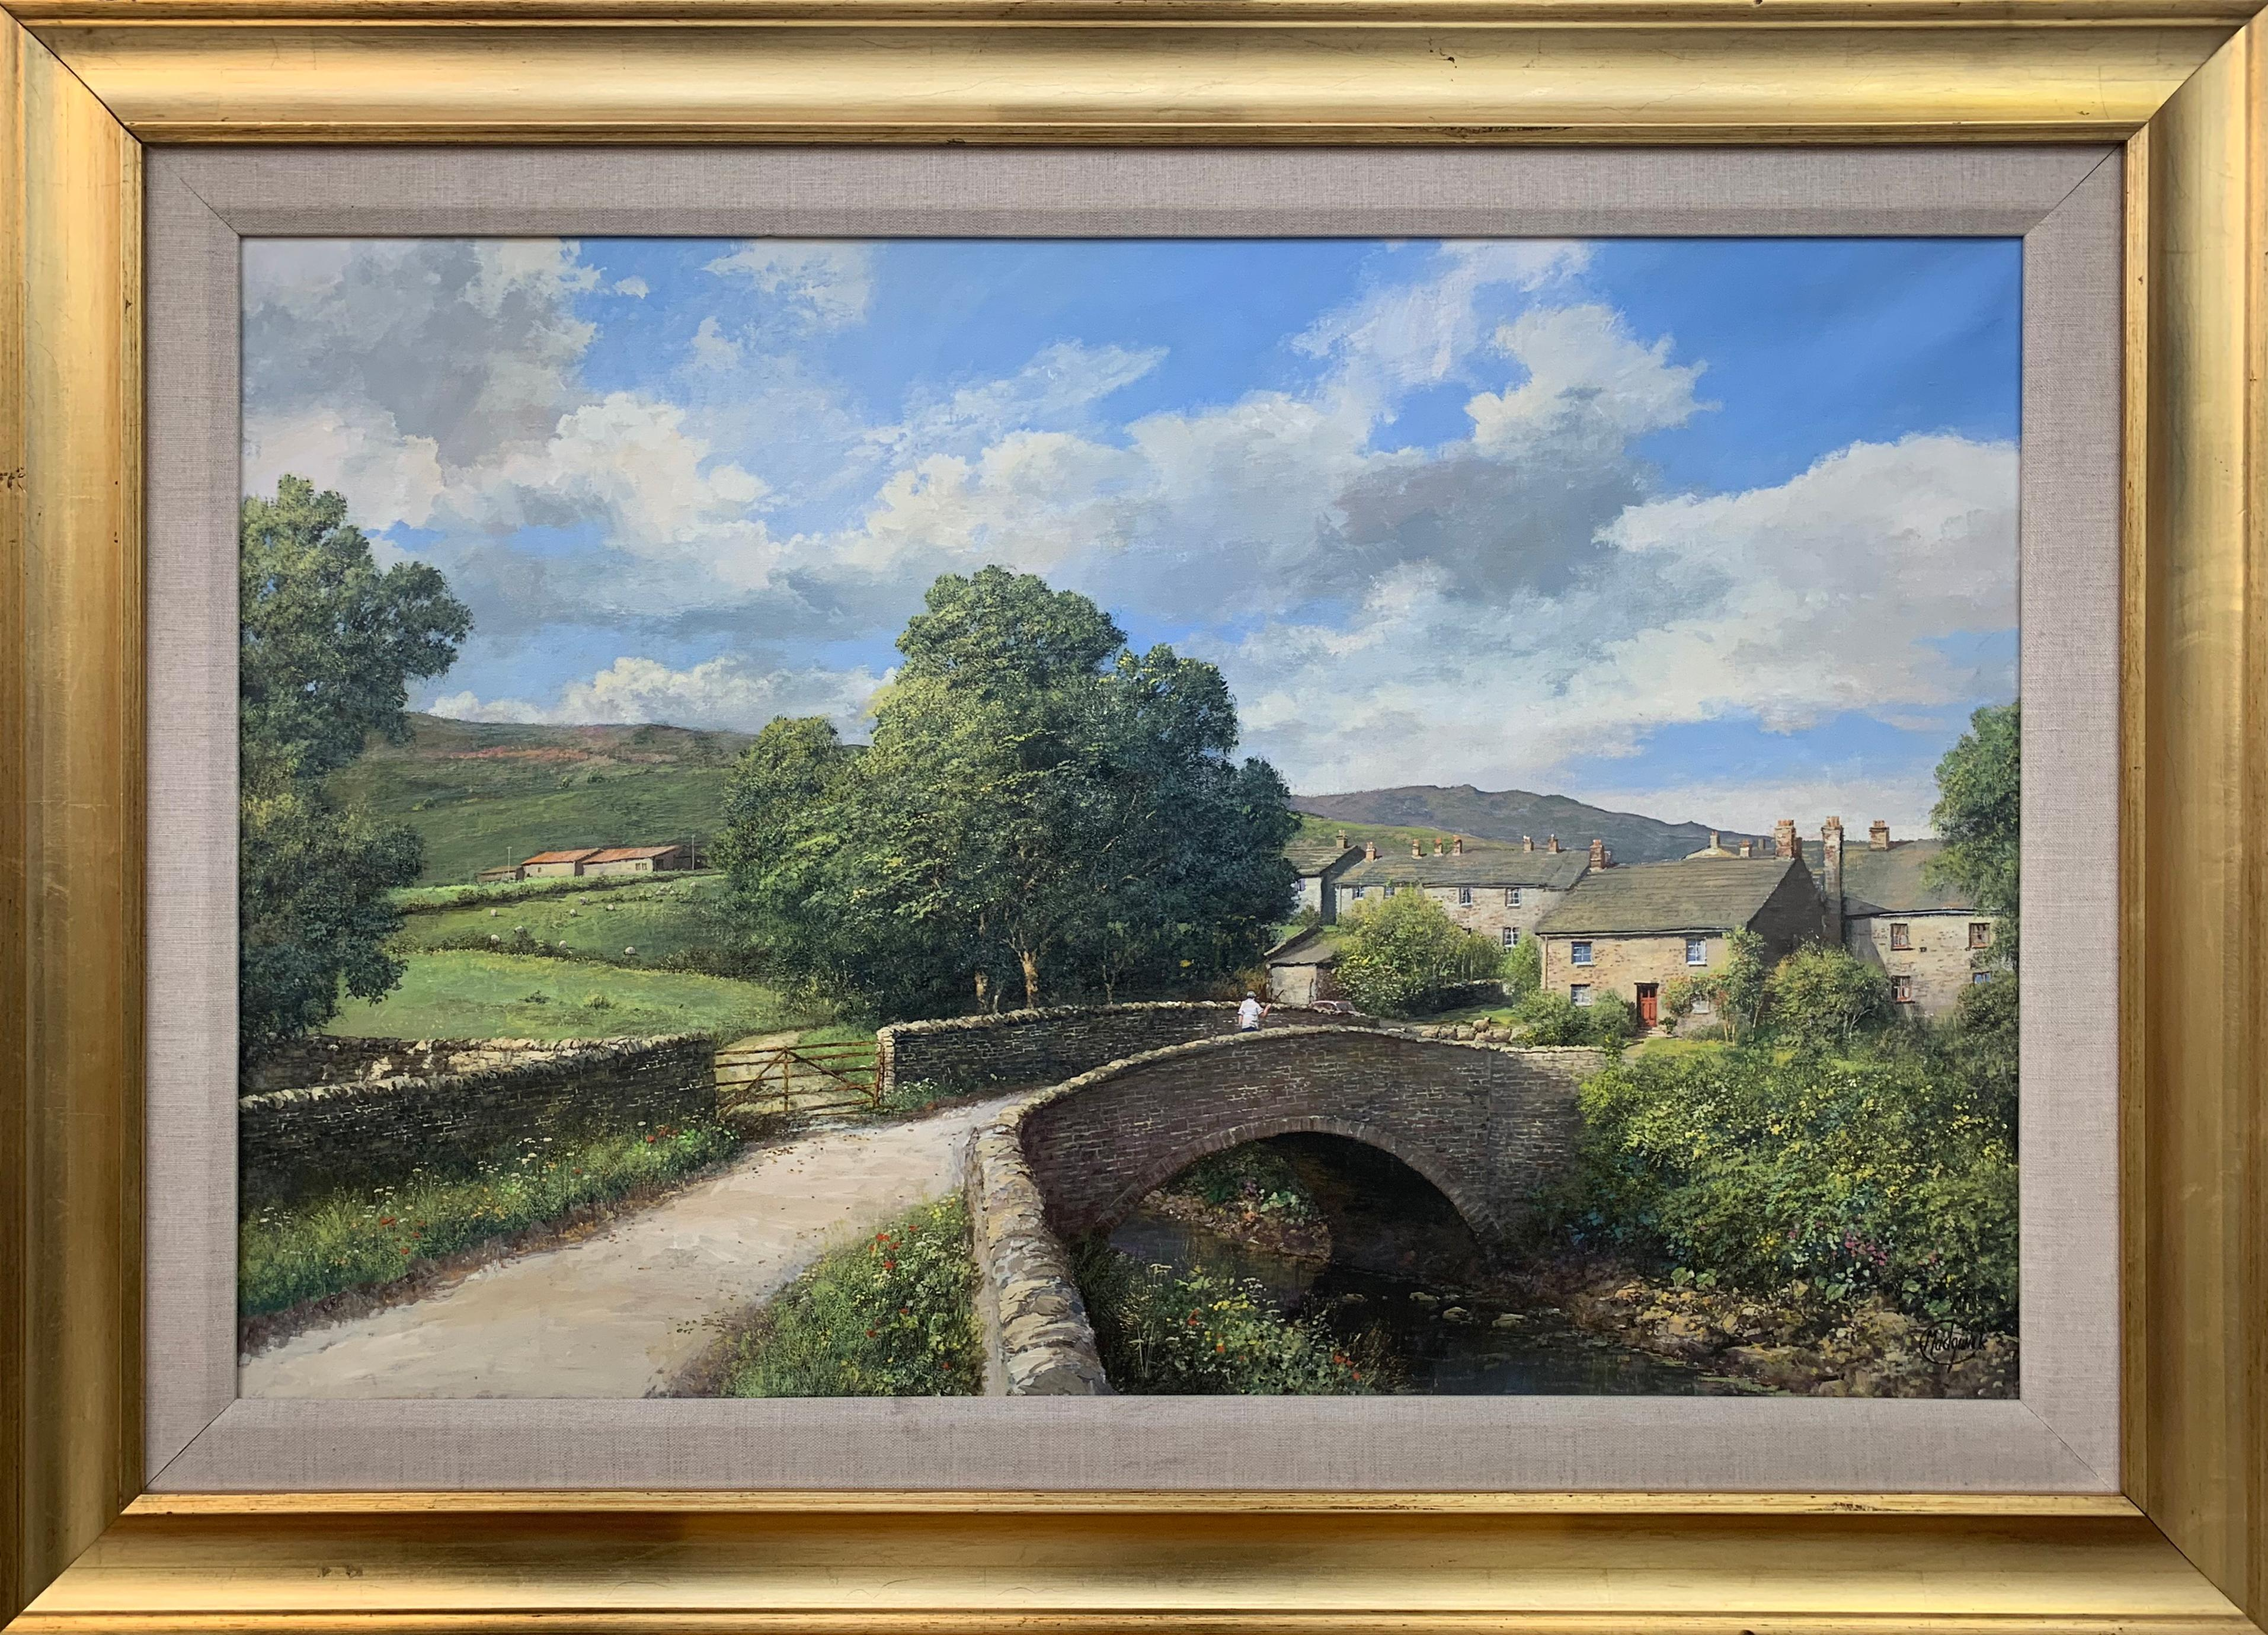 Original Oil Painting of Thwaite Village in Yorkshire Dales England British Art